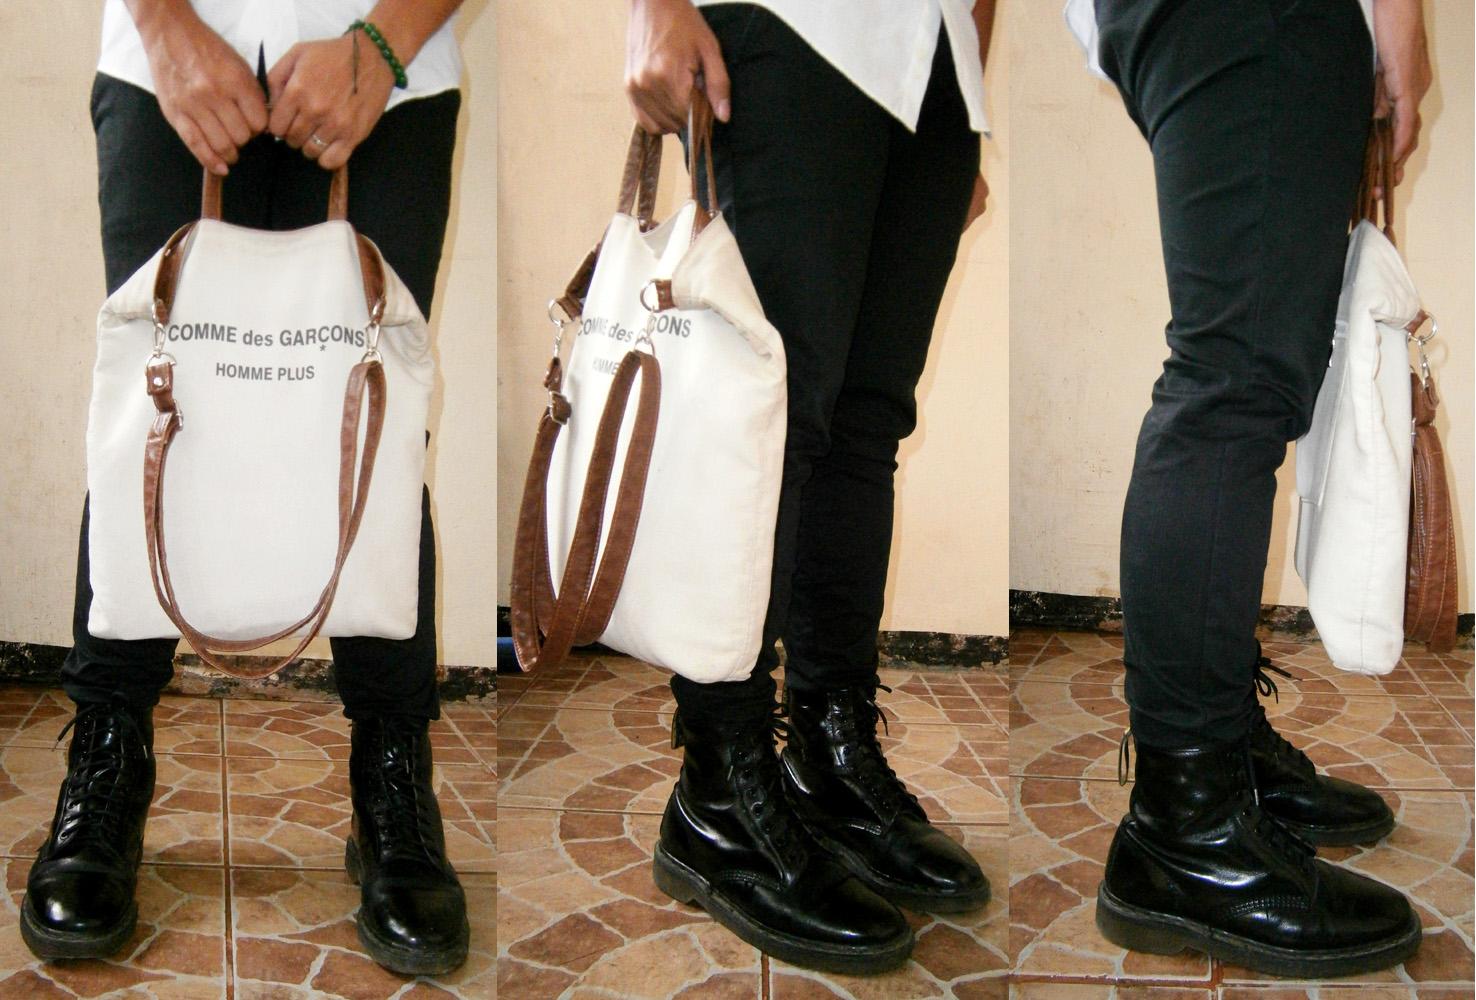 Black Giordano skinny pants, 8-hole Doc Martens, Comme des Garçons Homme Plus Canvas Tote - Manila, Philippines